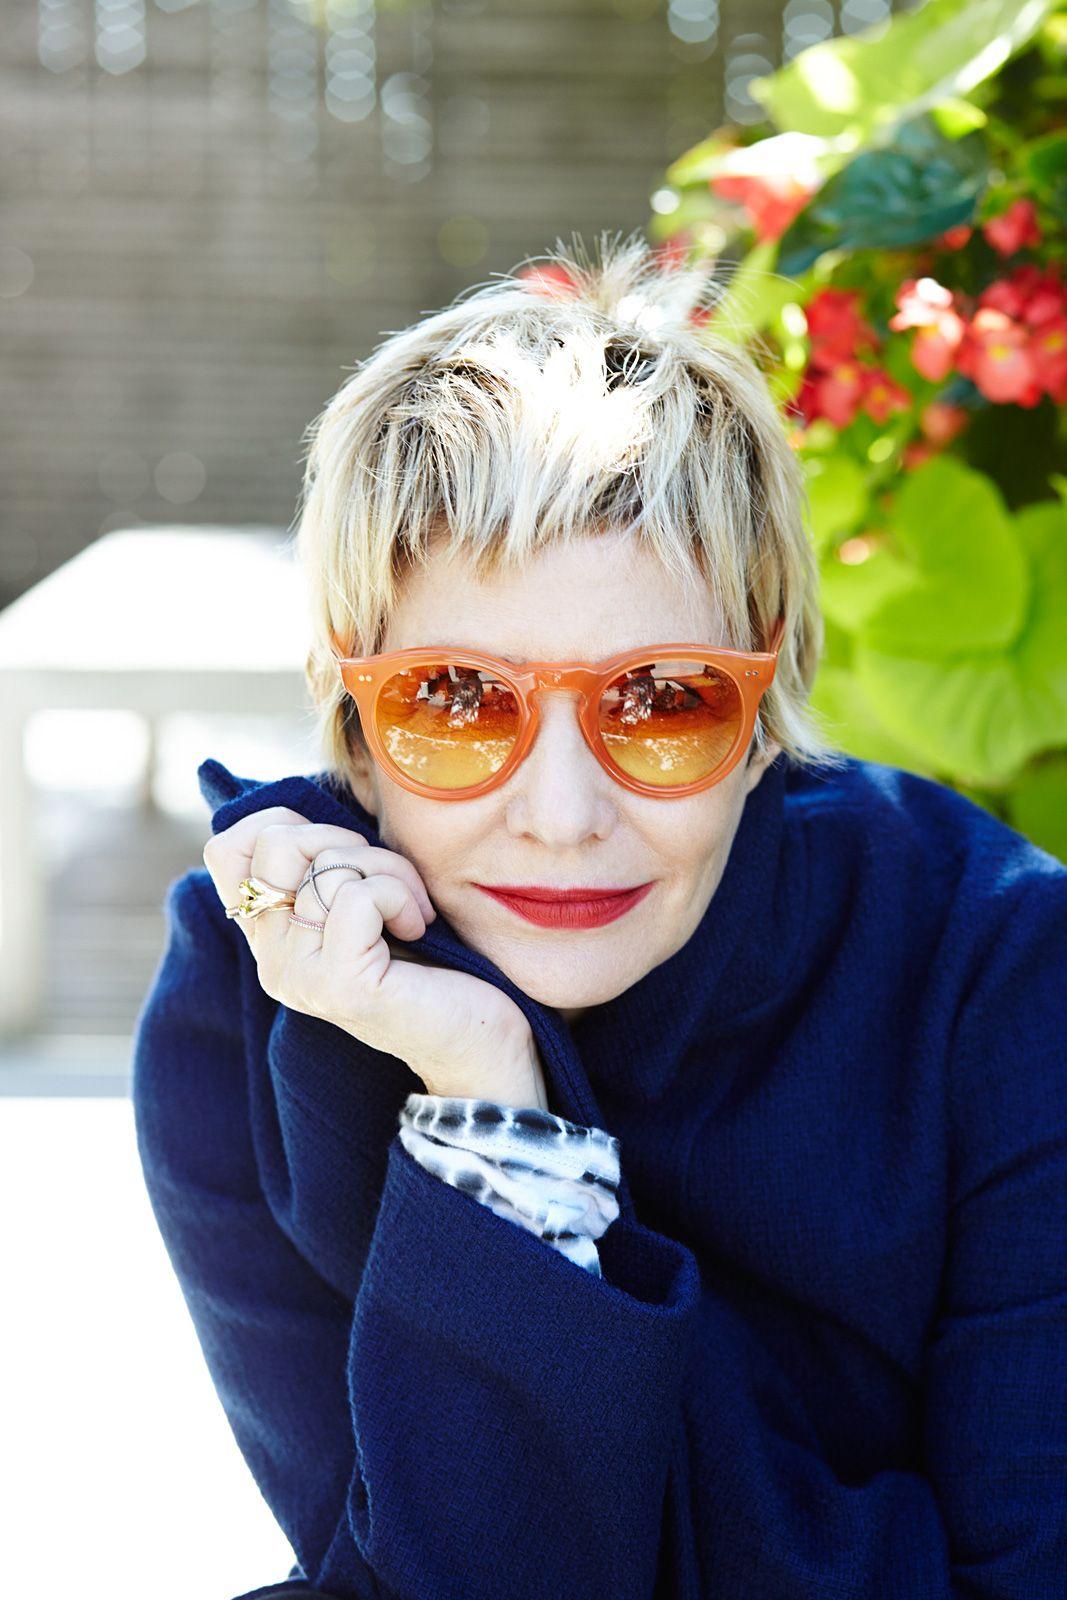 Lori goldstein stylist new york city apartments stylists like